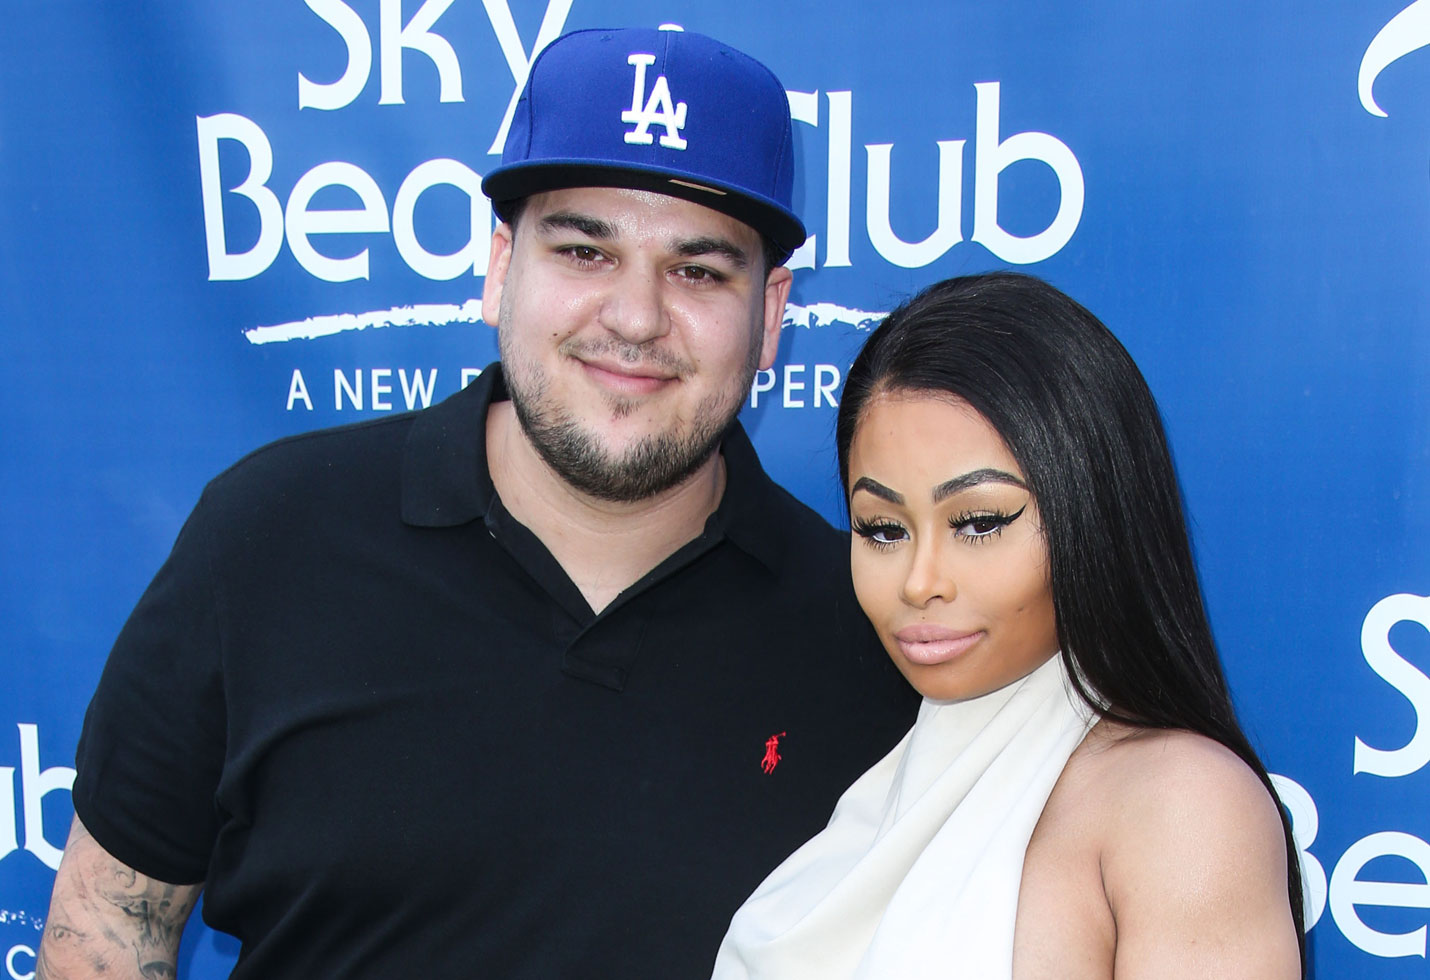 https://people.com/tv/rob-kardashian-doesnt-have-relationship-blac-chyna/